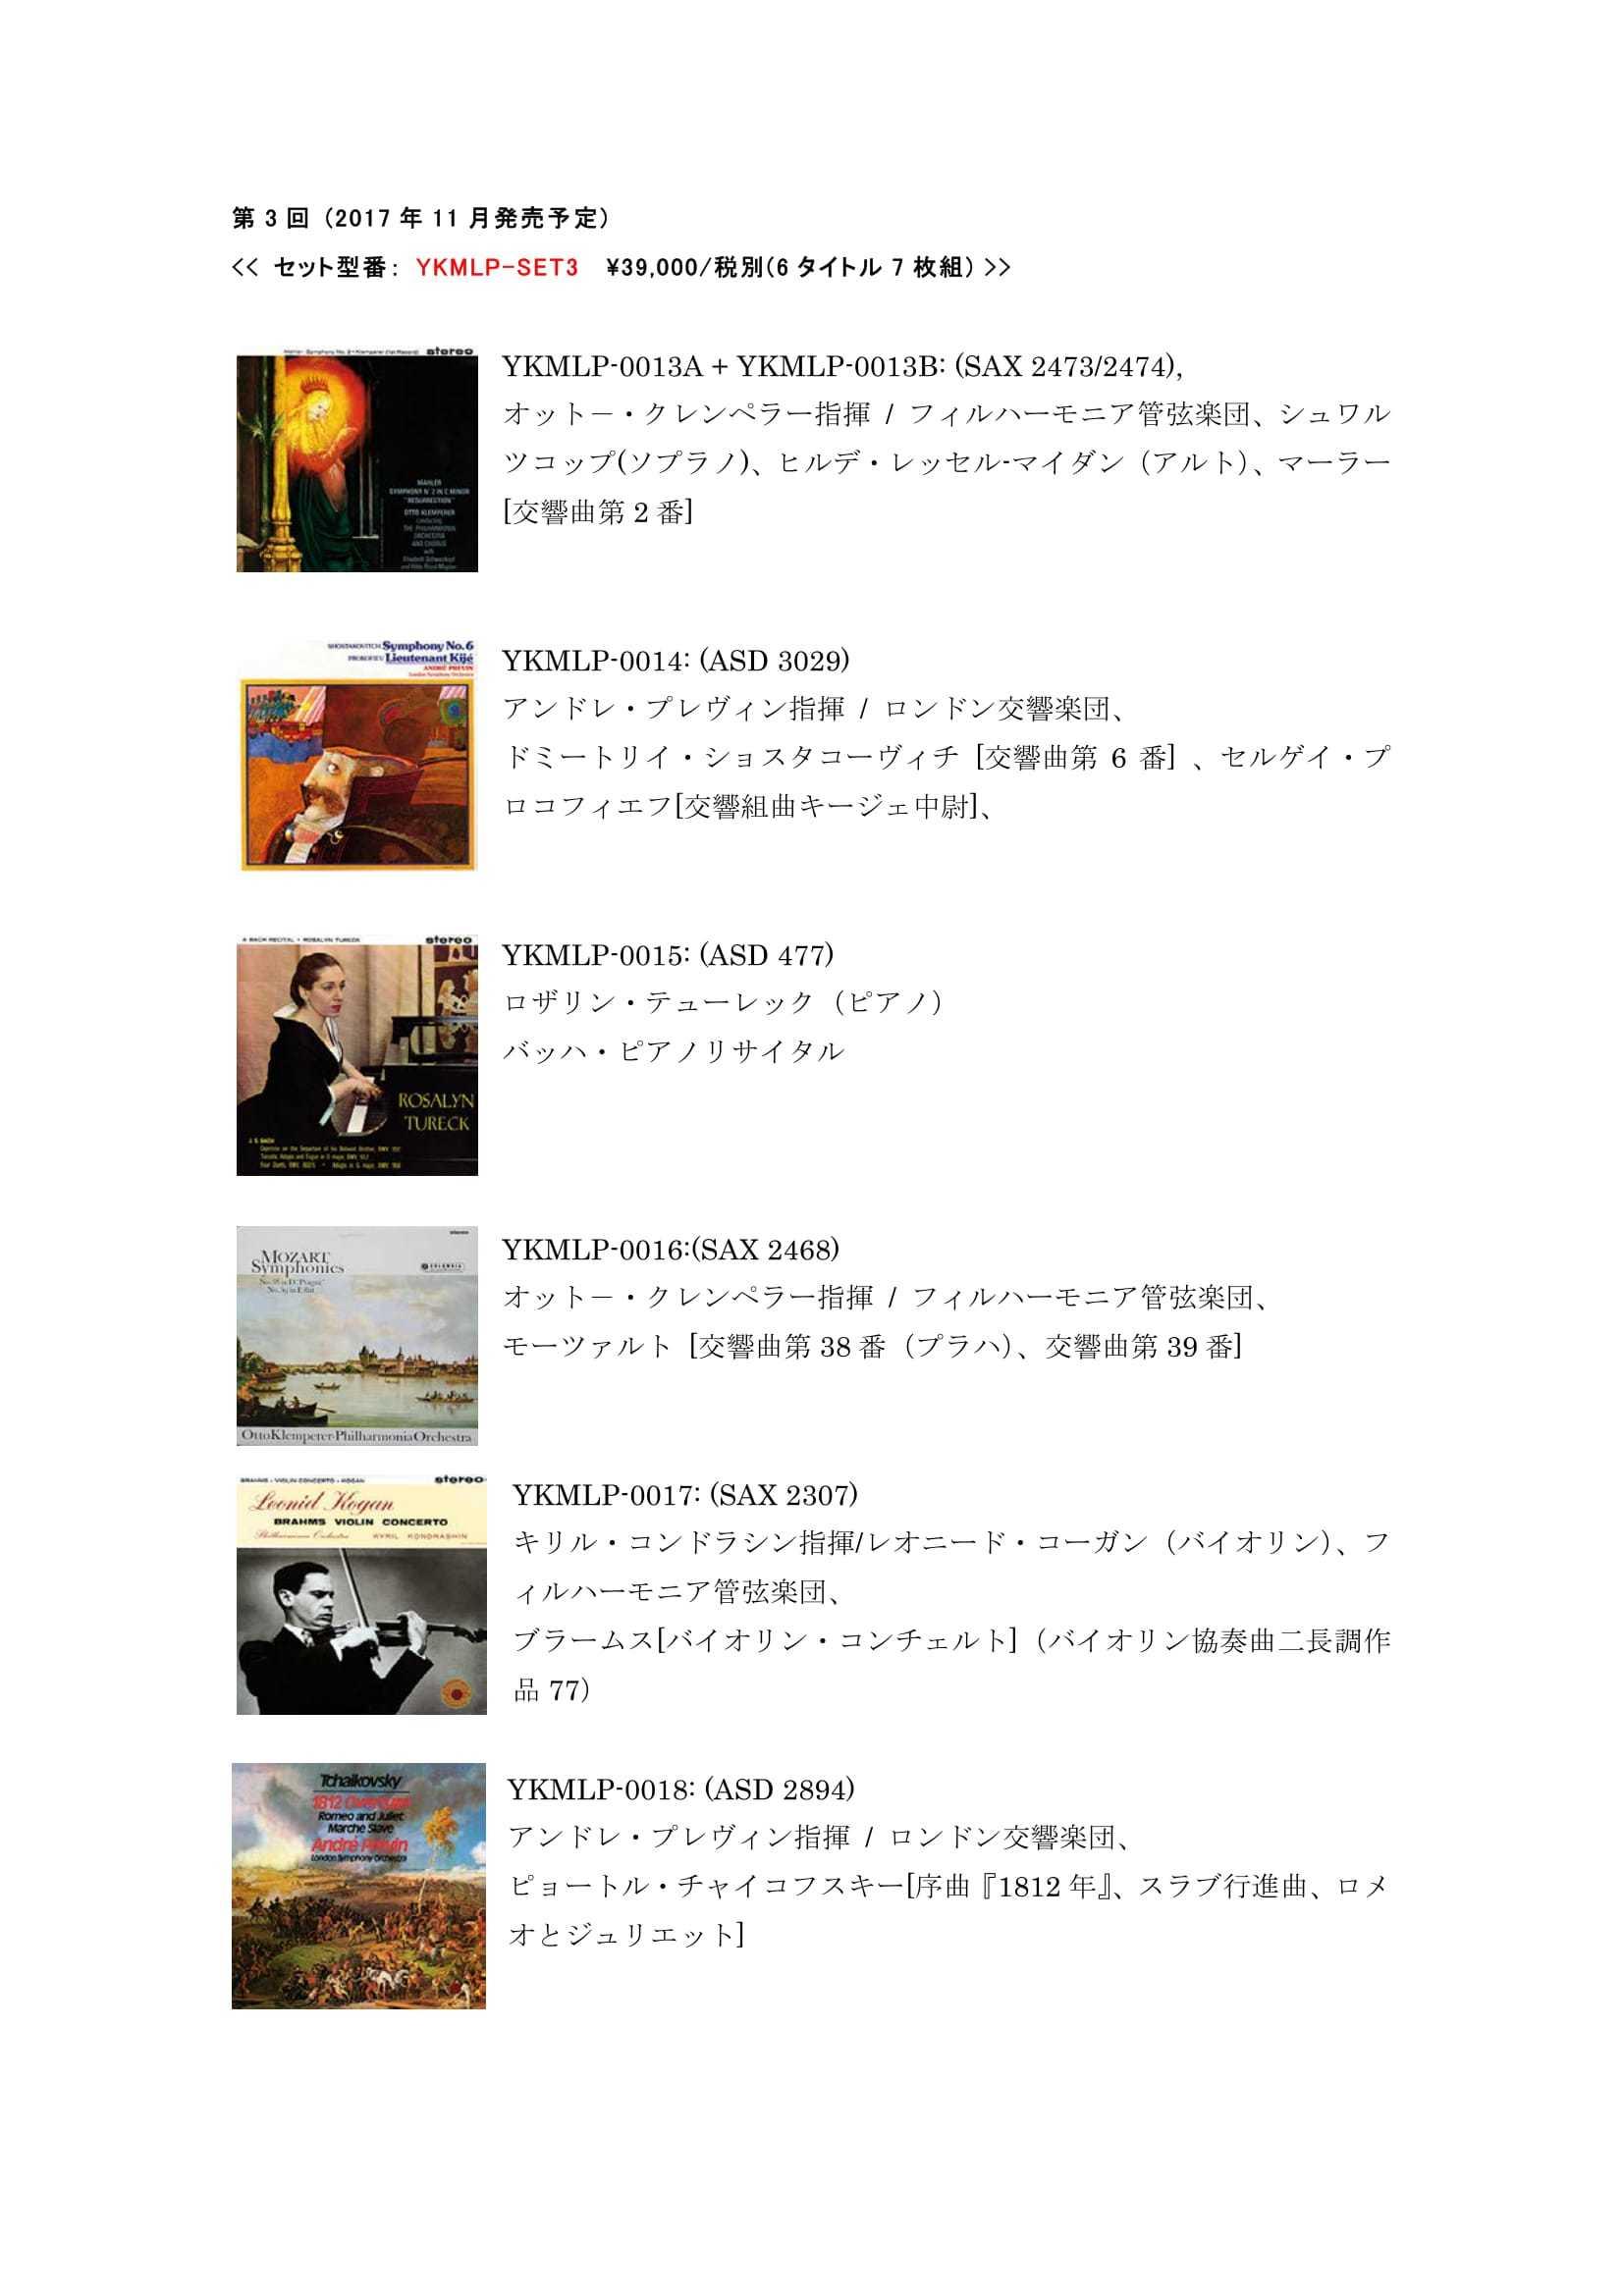 YUKIMUより限定レコードセット第3弾、第4弾同時予約開始!!_c0113001_13245340.jpg